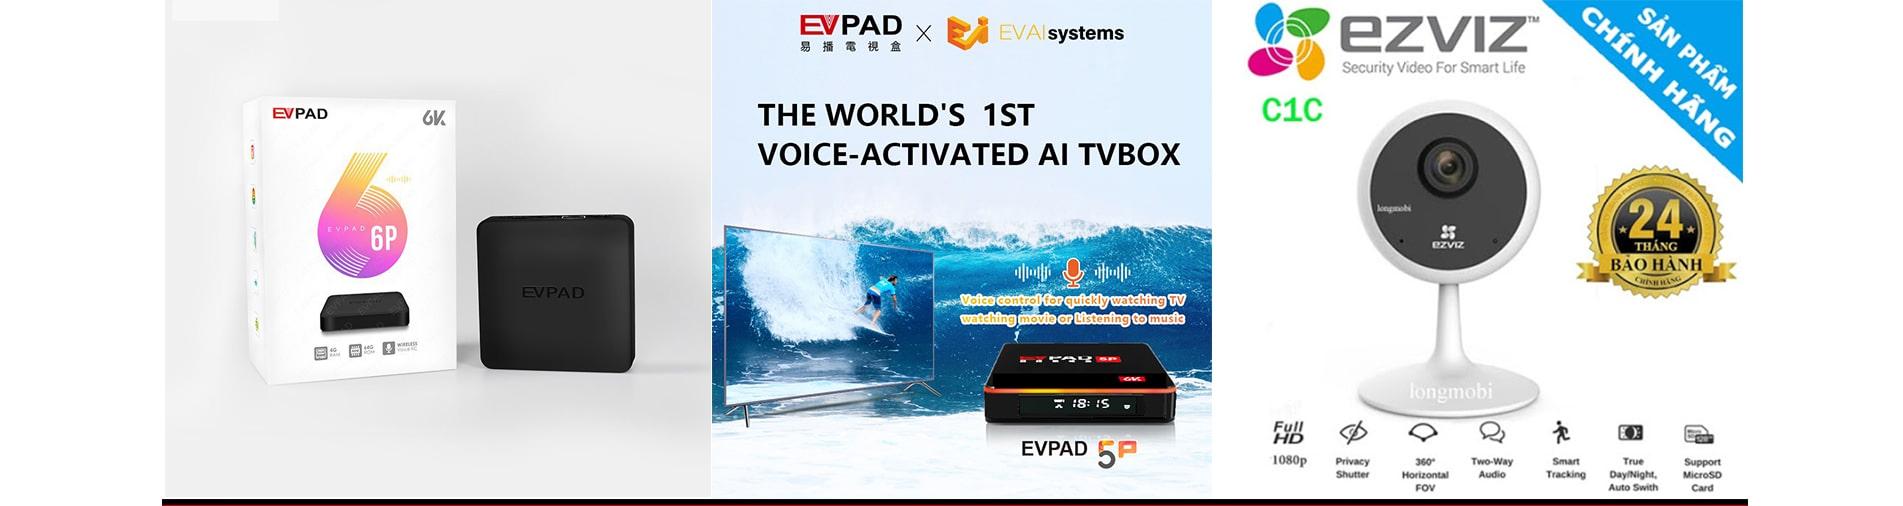 Banner Evpad 6k 2